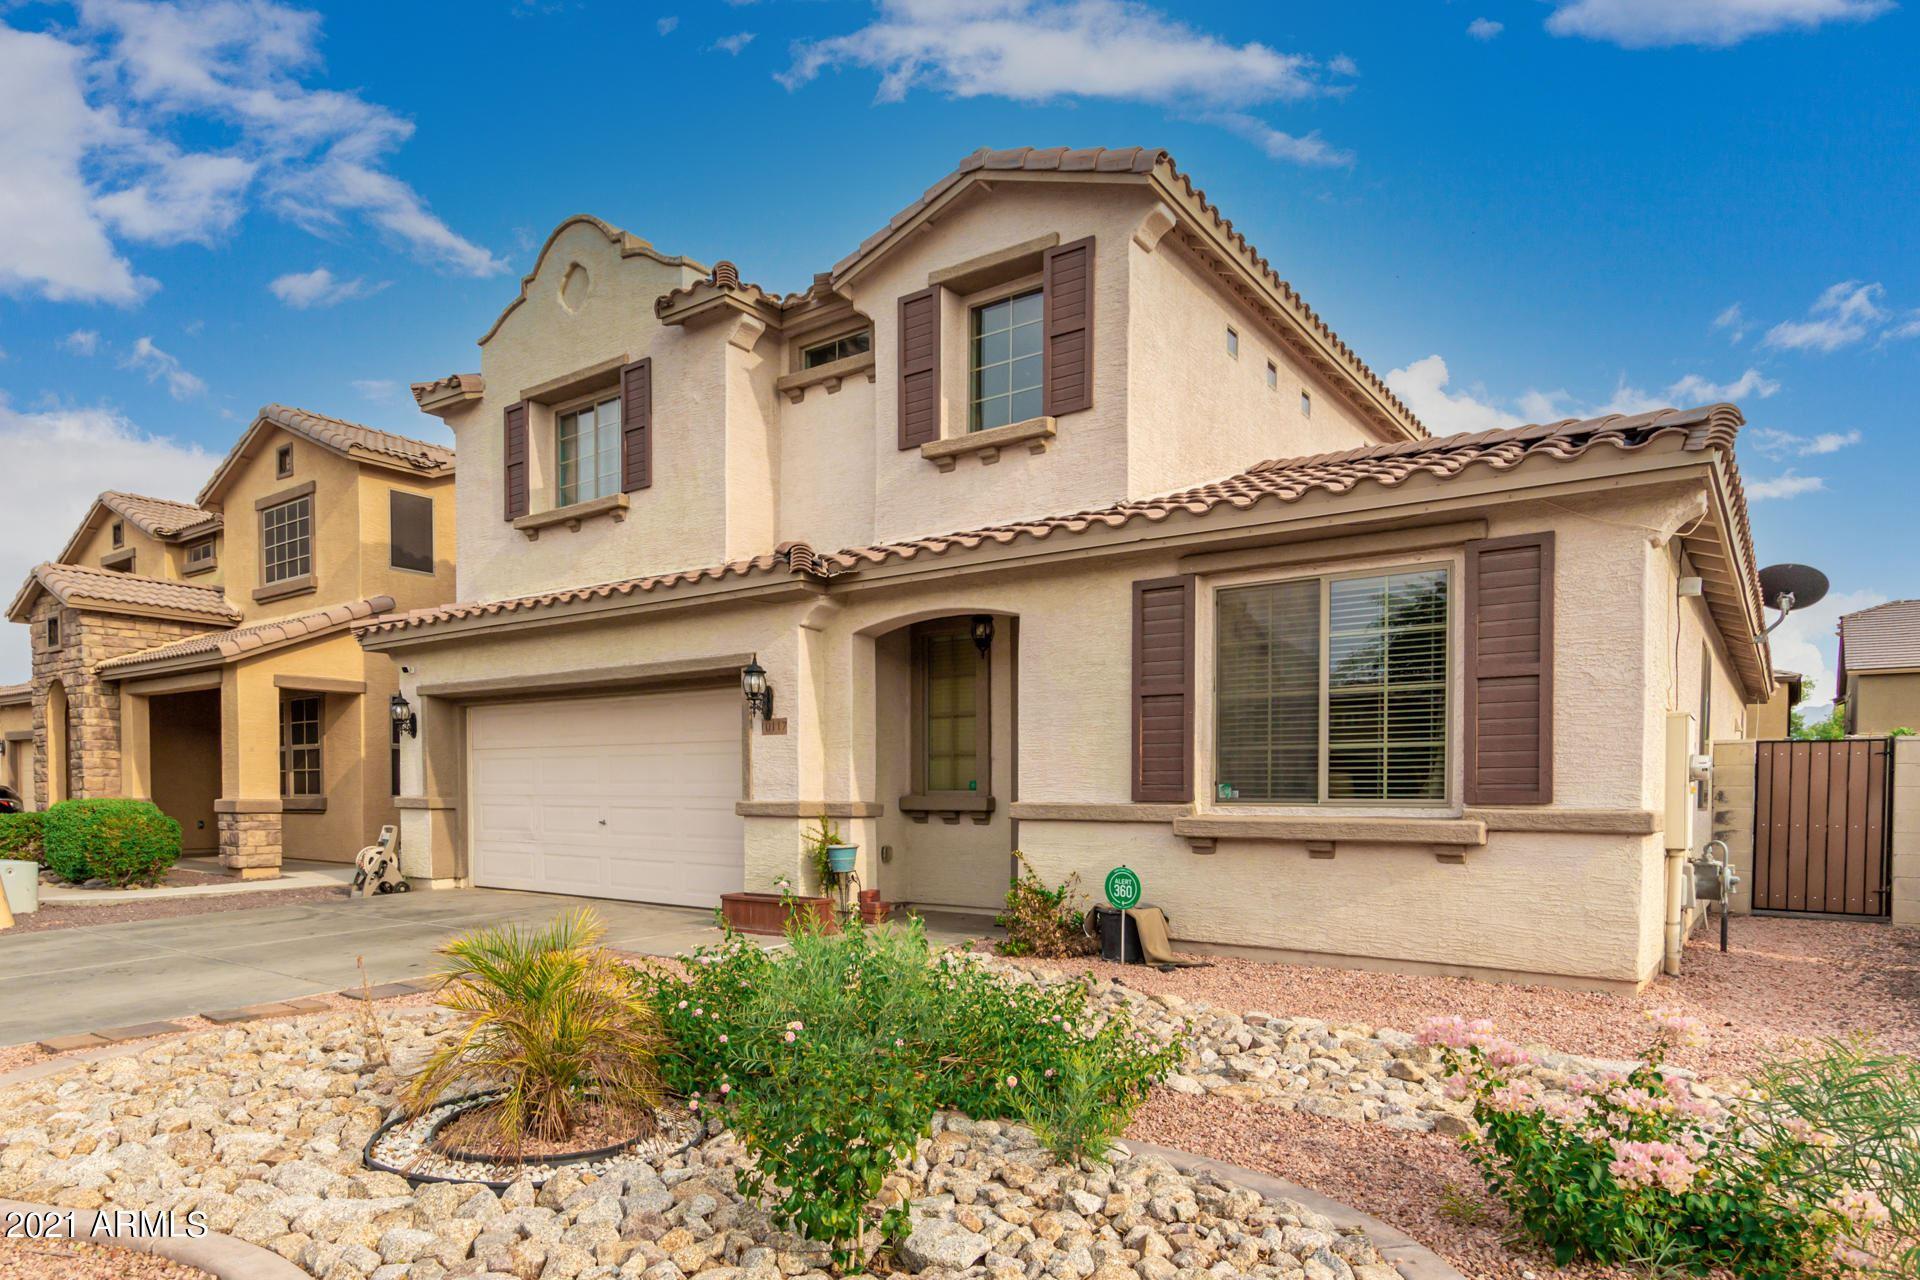 Photo of 10117 W MARGUERITE Avenue, Tolleson, AZ 85353 (MLS # 6271537)